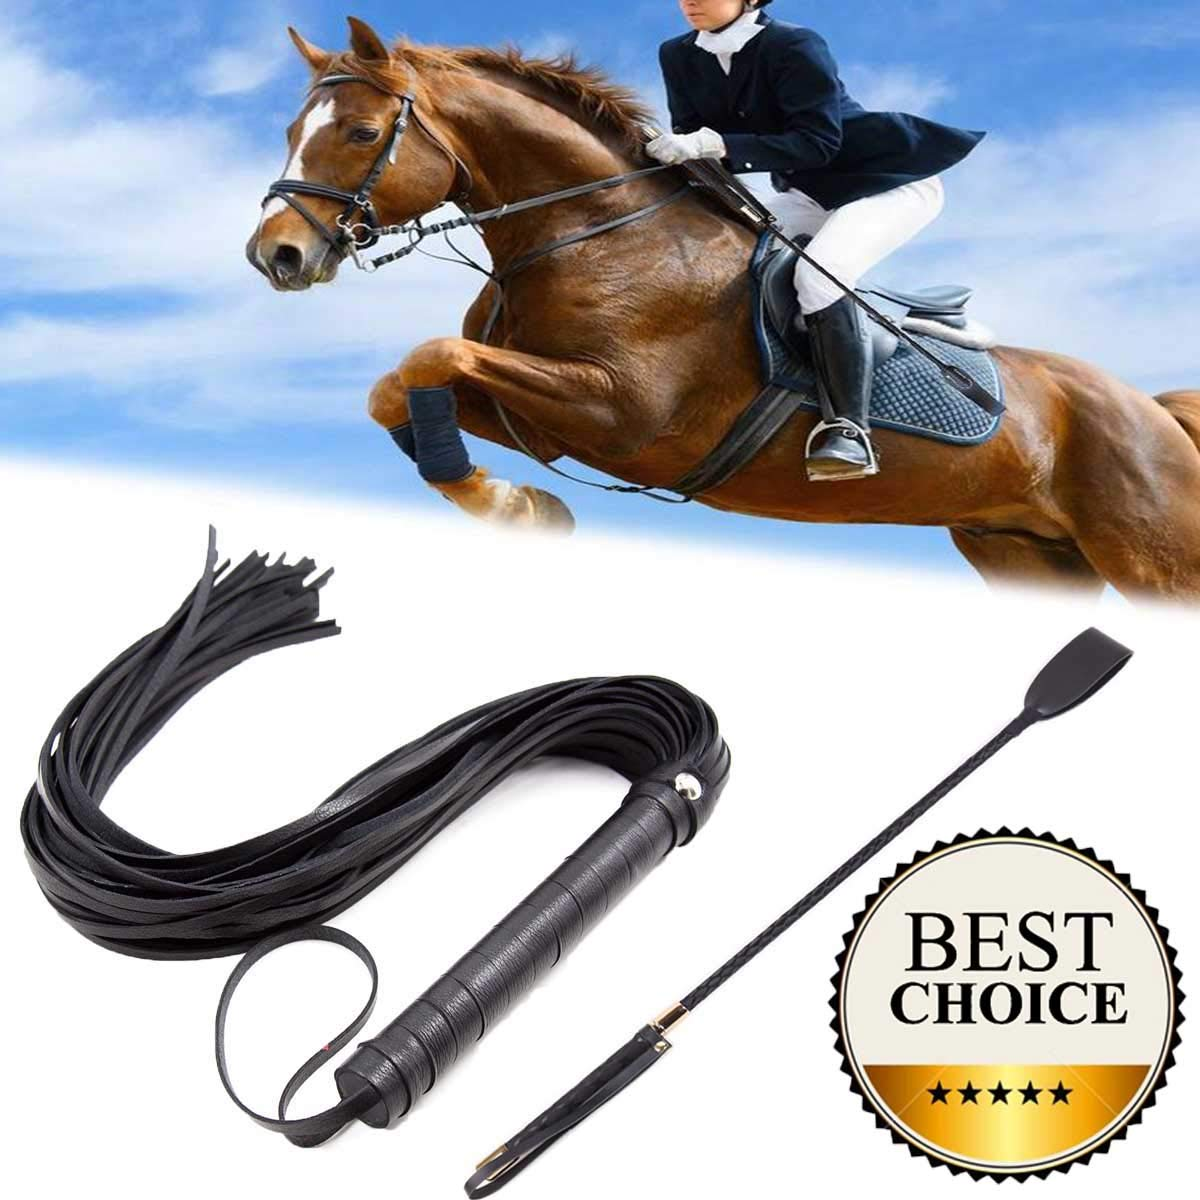 GABraden 18 Riding Crop Jump Bat/and Faux Leather Short Horse Riding Crop,Premium Quality Crops,Equestrianism Horse Crop,Black